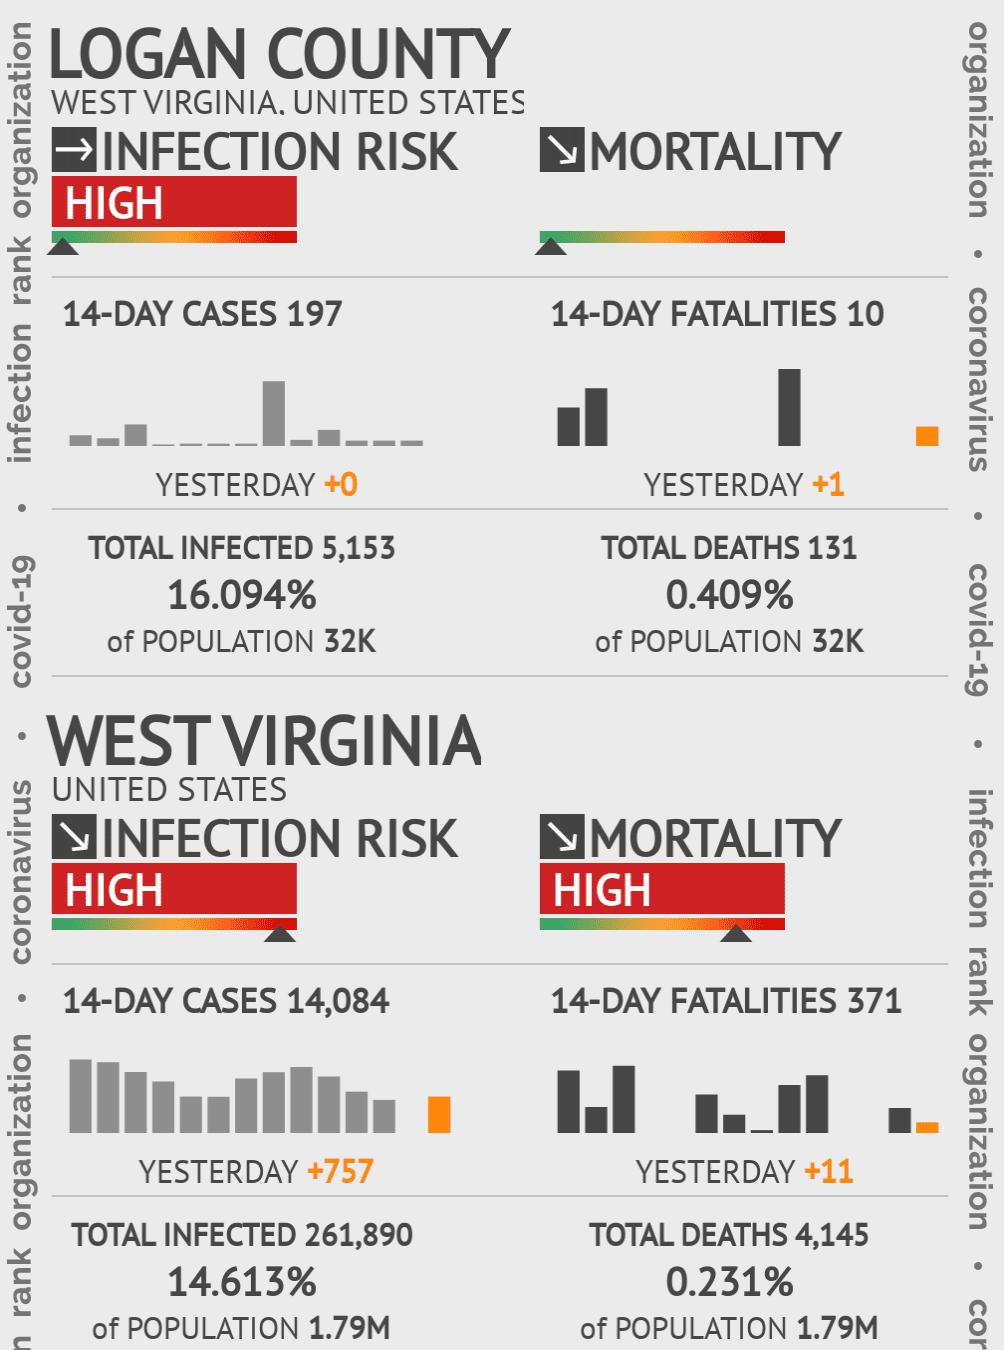 Logan County Coronavirus Covid-19 Risk of Infection on July 24, 2021